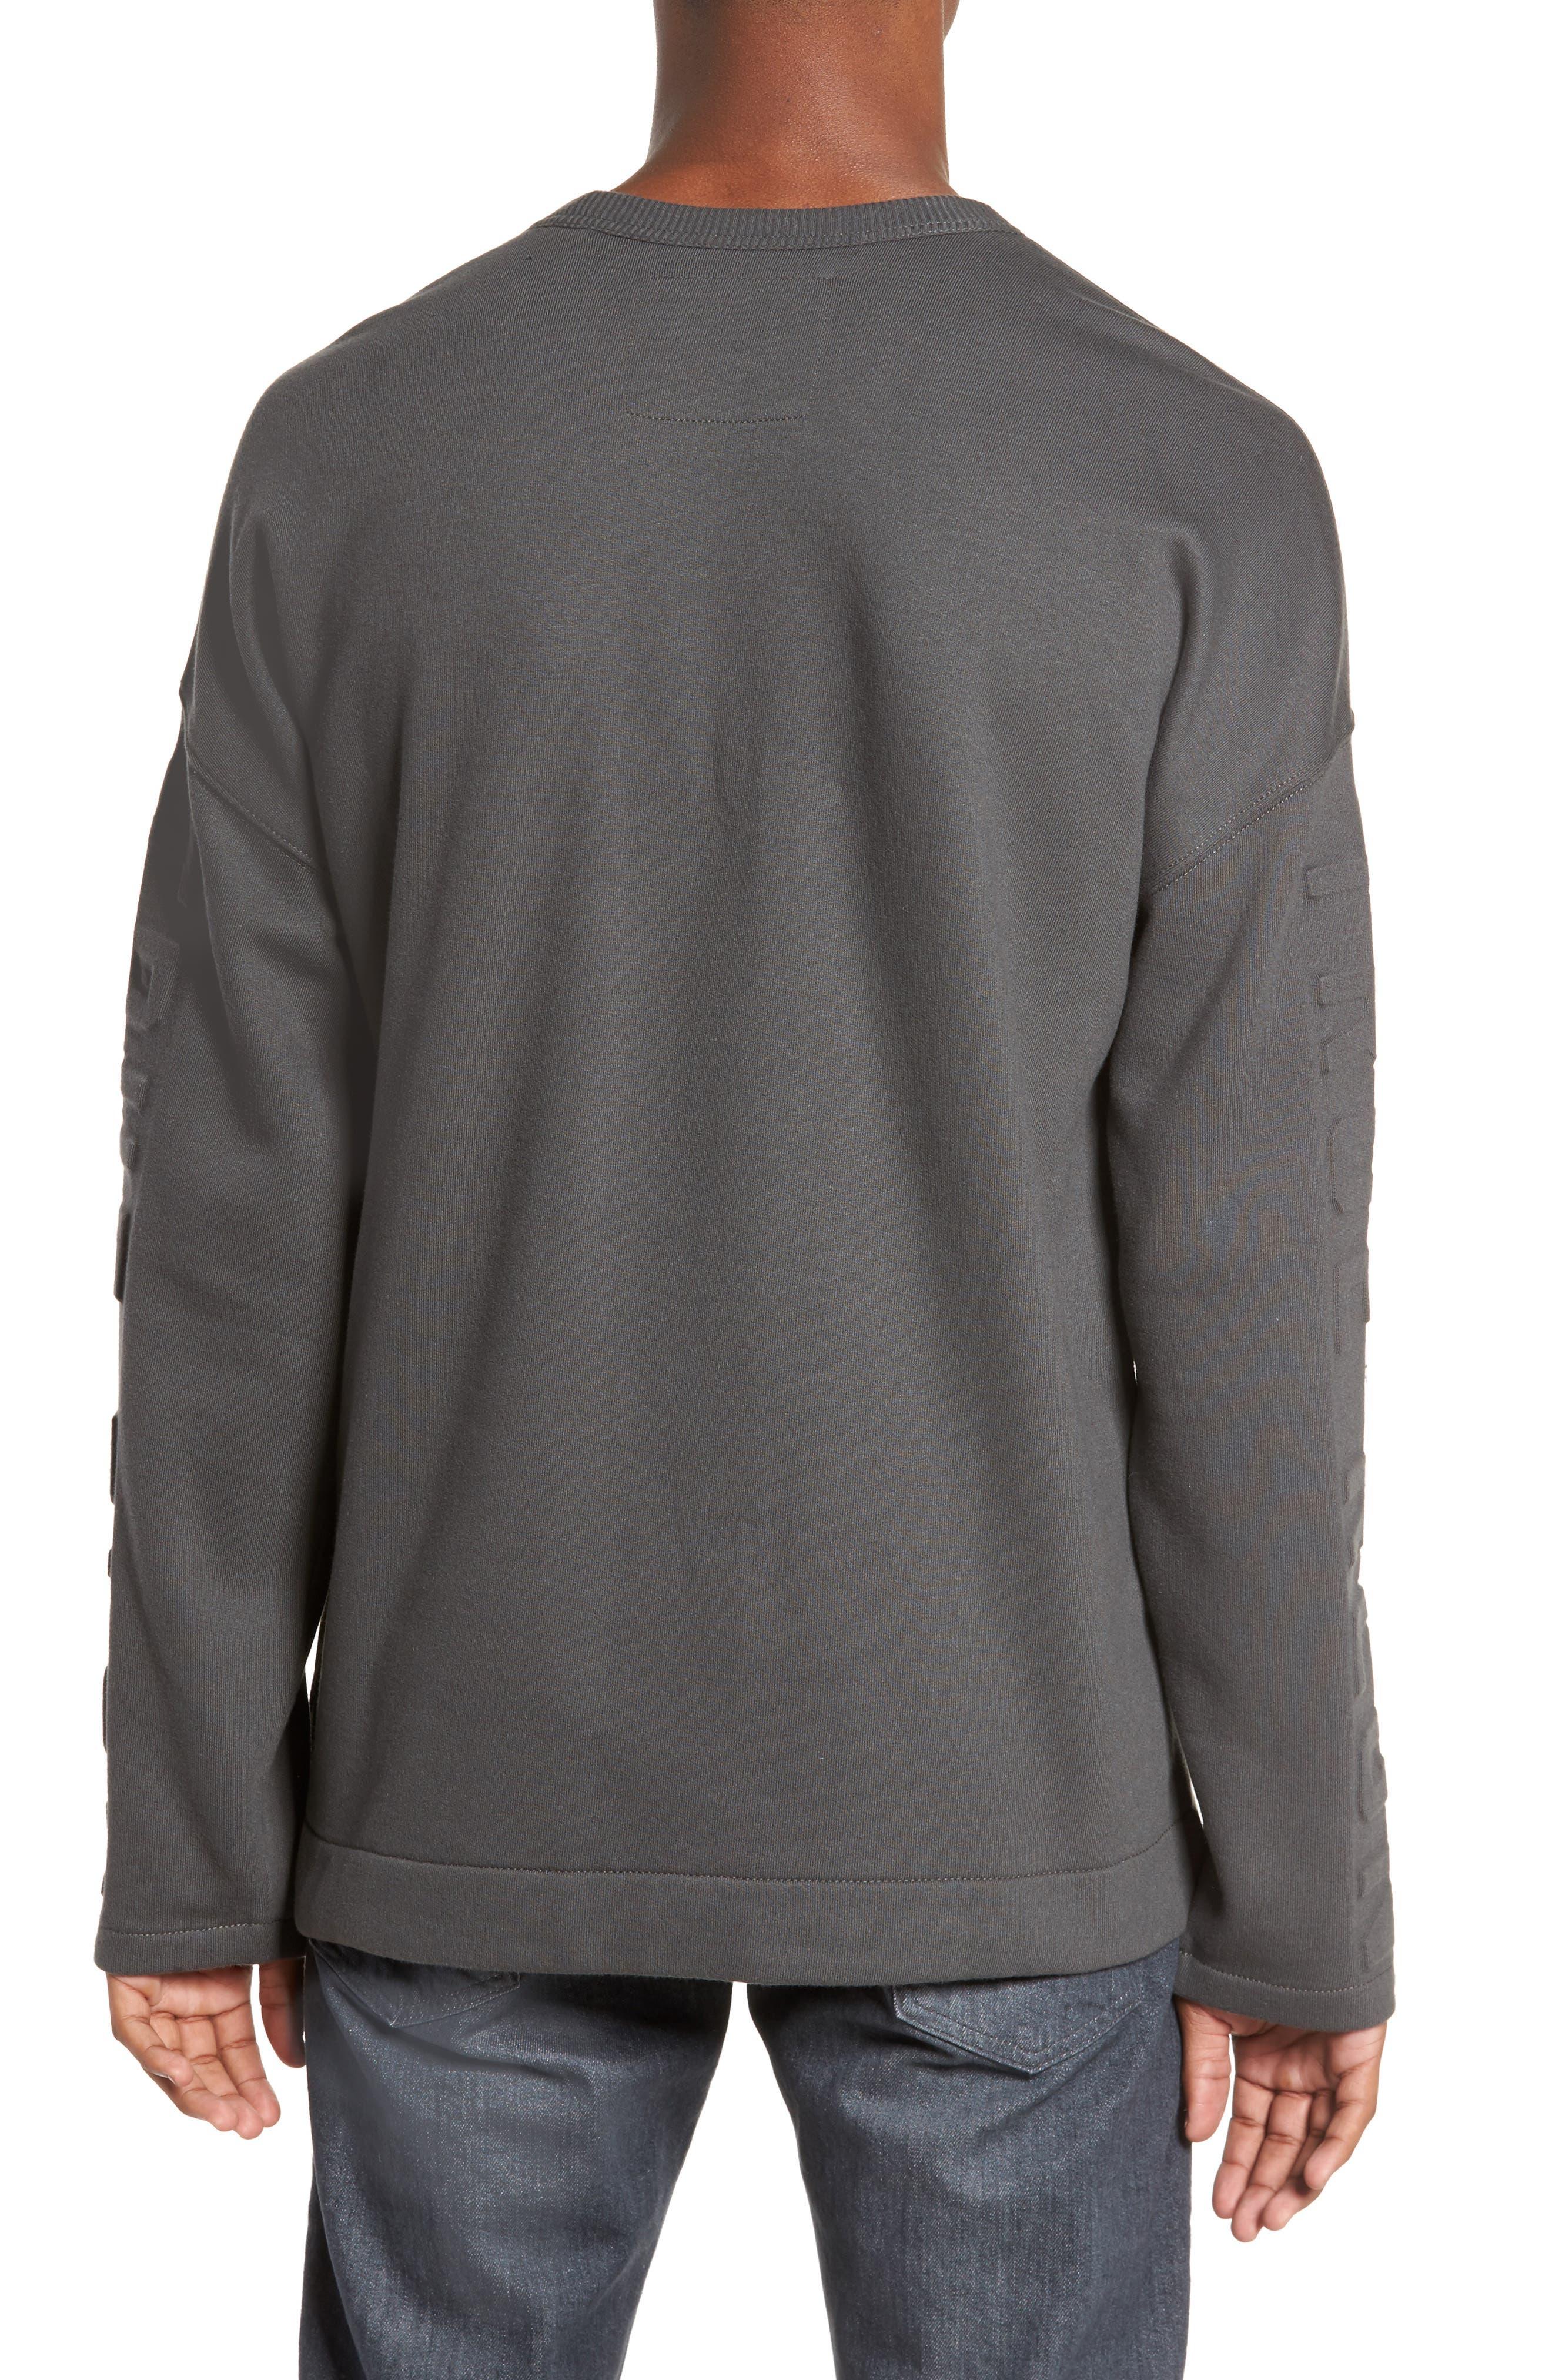 Oversize Fleece Sweatshirt,                             Alternate thumbnail 2, color,                             020